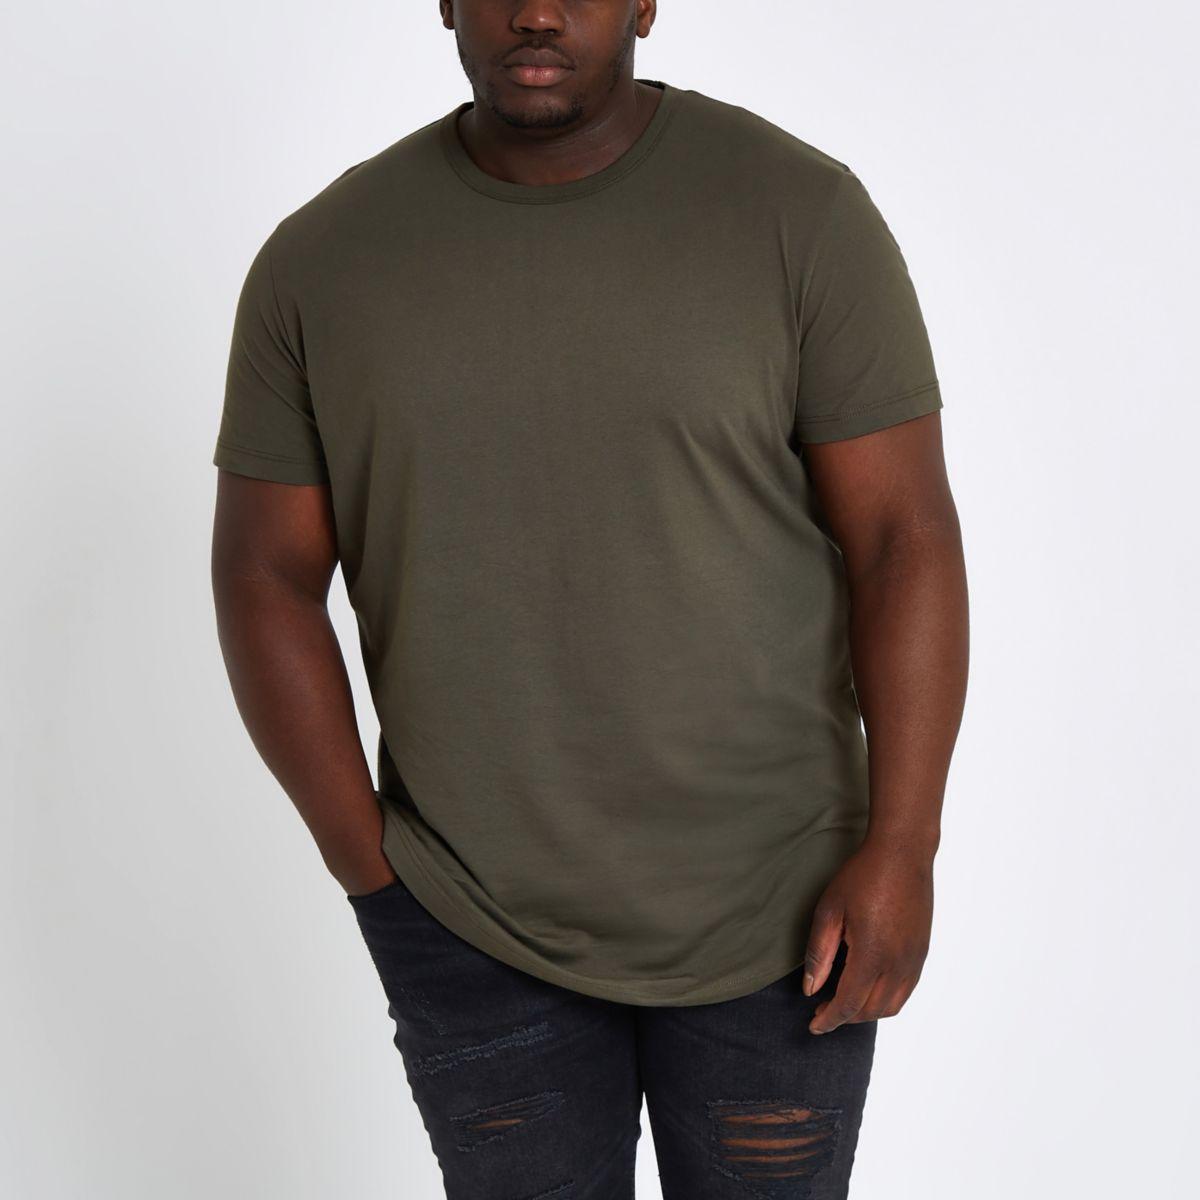 Big and Tall khaki T-shirt